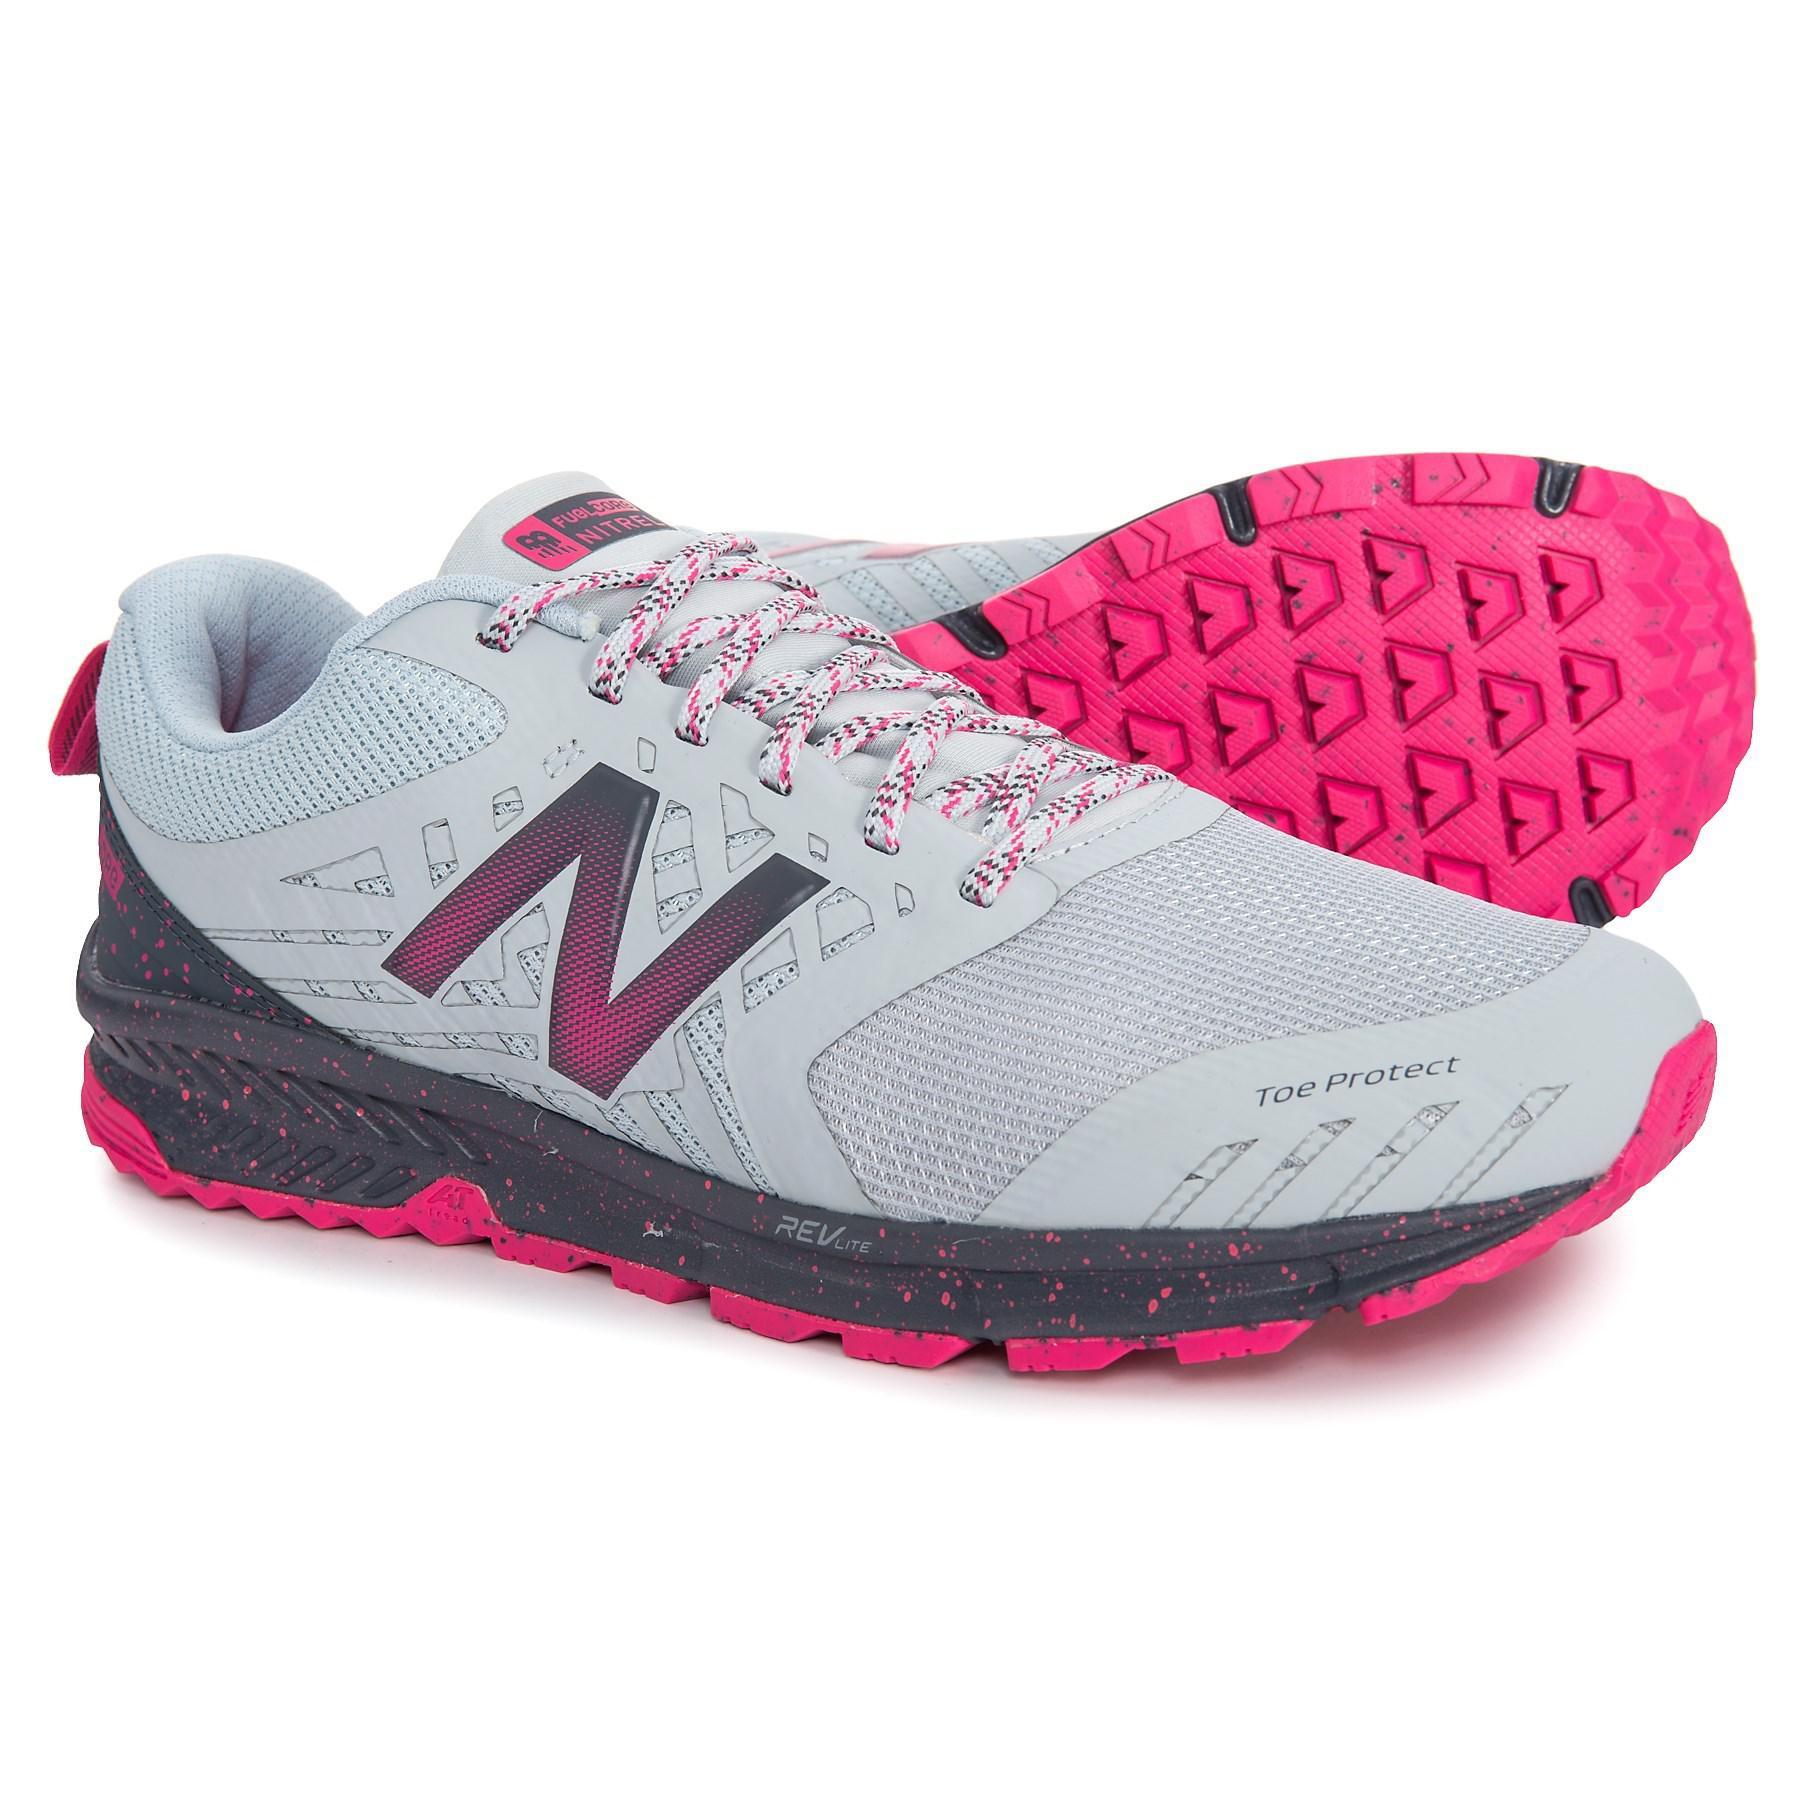 78e0e94a54316 New Balance Fuelcore Nitrel Trail Running Shoes (for Women) - Lyst